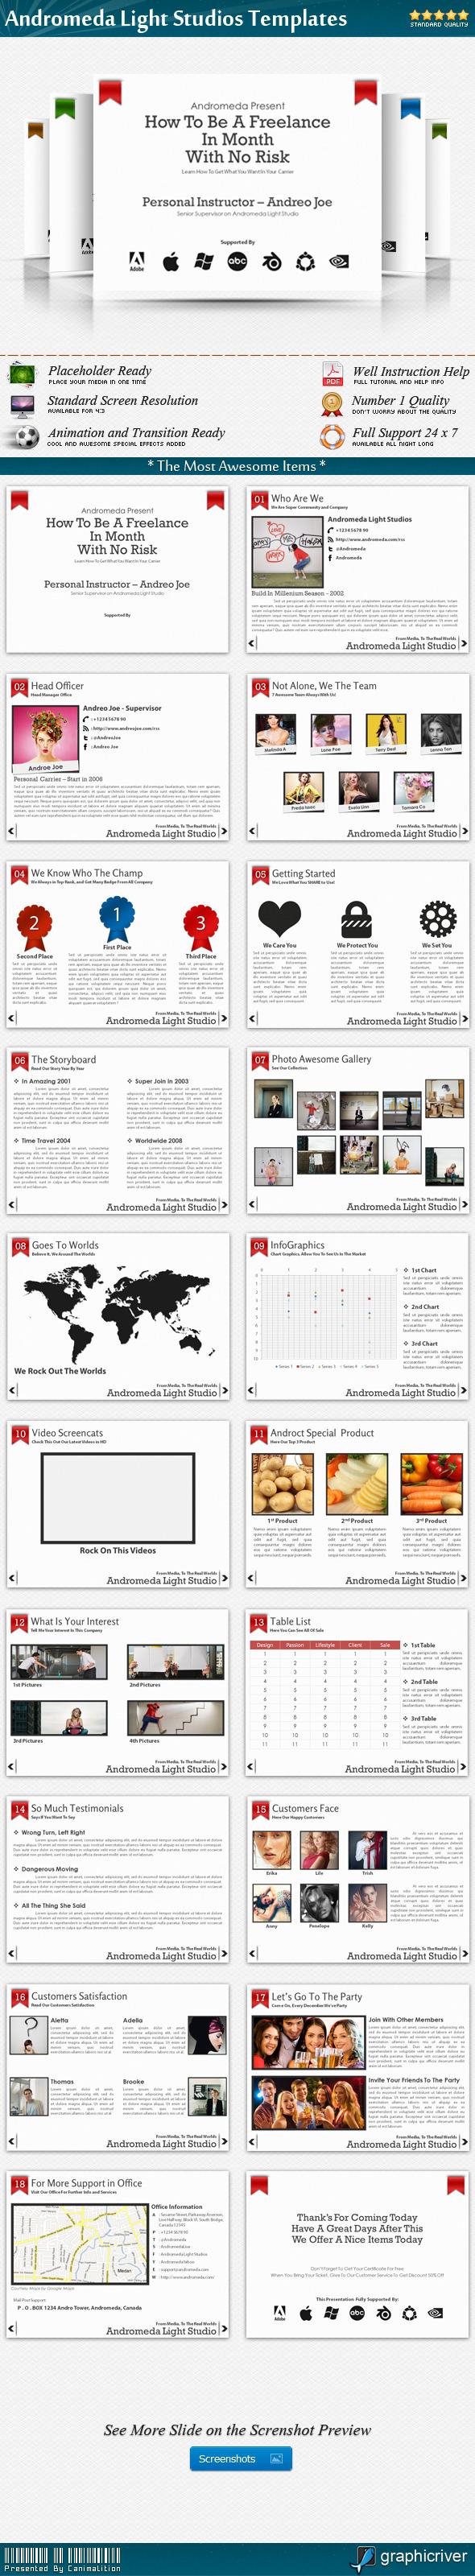 Andromeda Light Studios Presentation Templates - Creative PowerPoint Templates